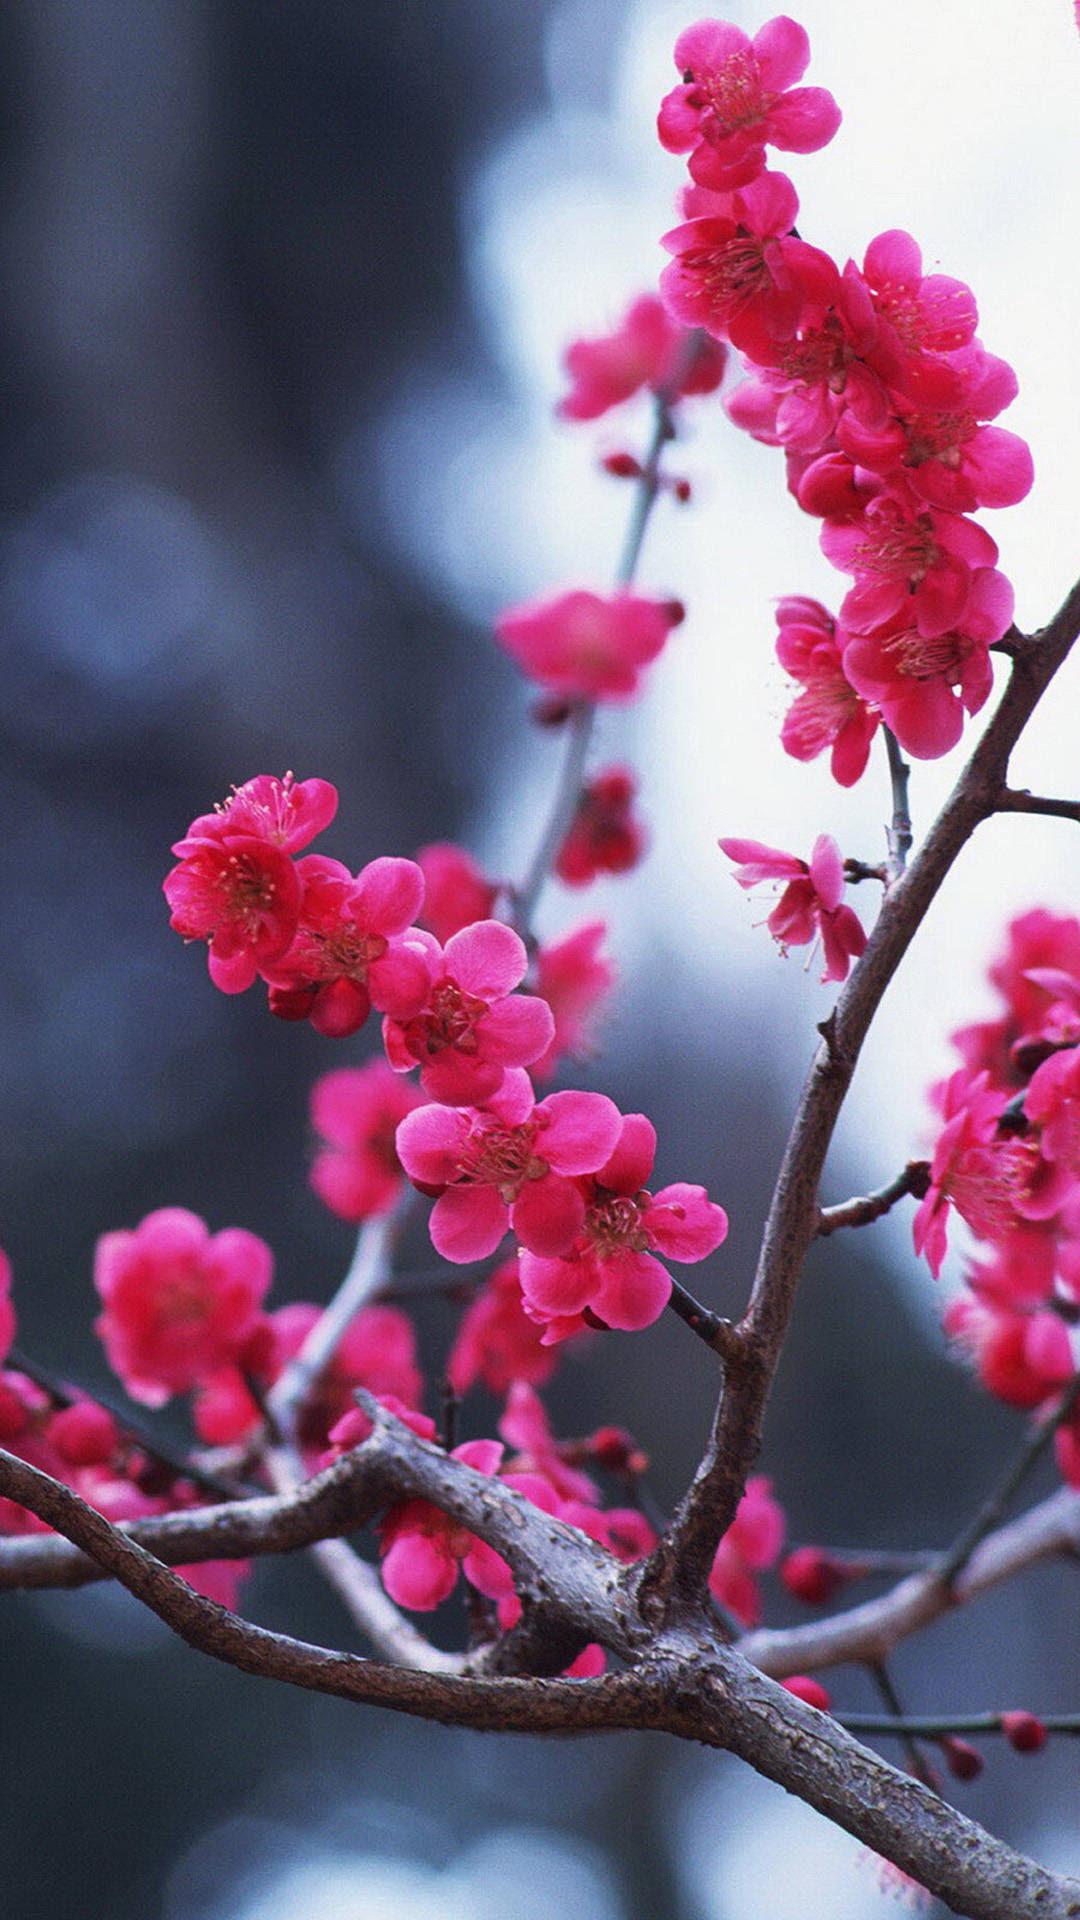 Cherry Blossom iPhone HD Wallpaper | PixelsTalk.Net